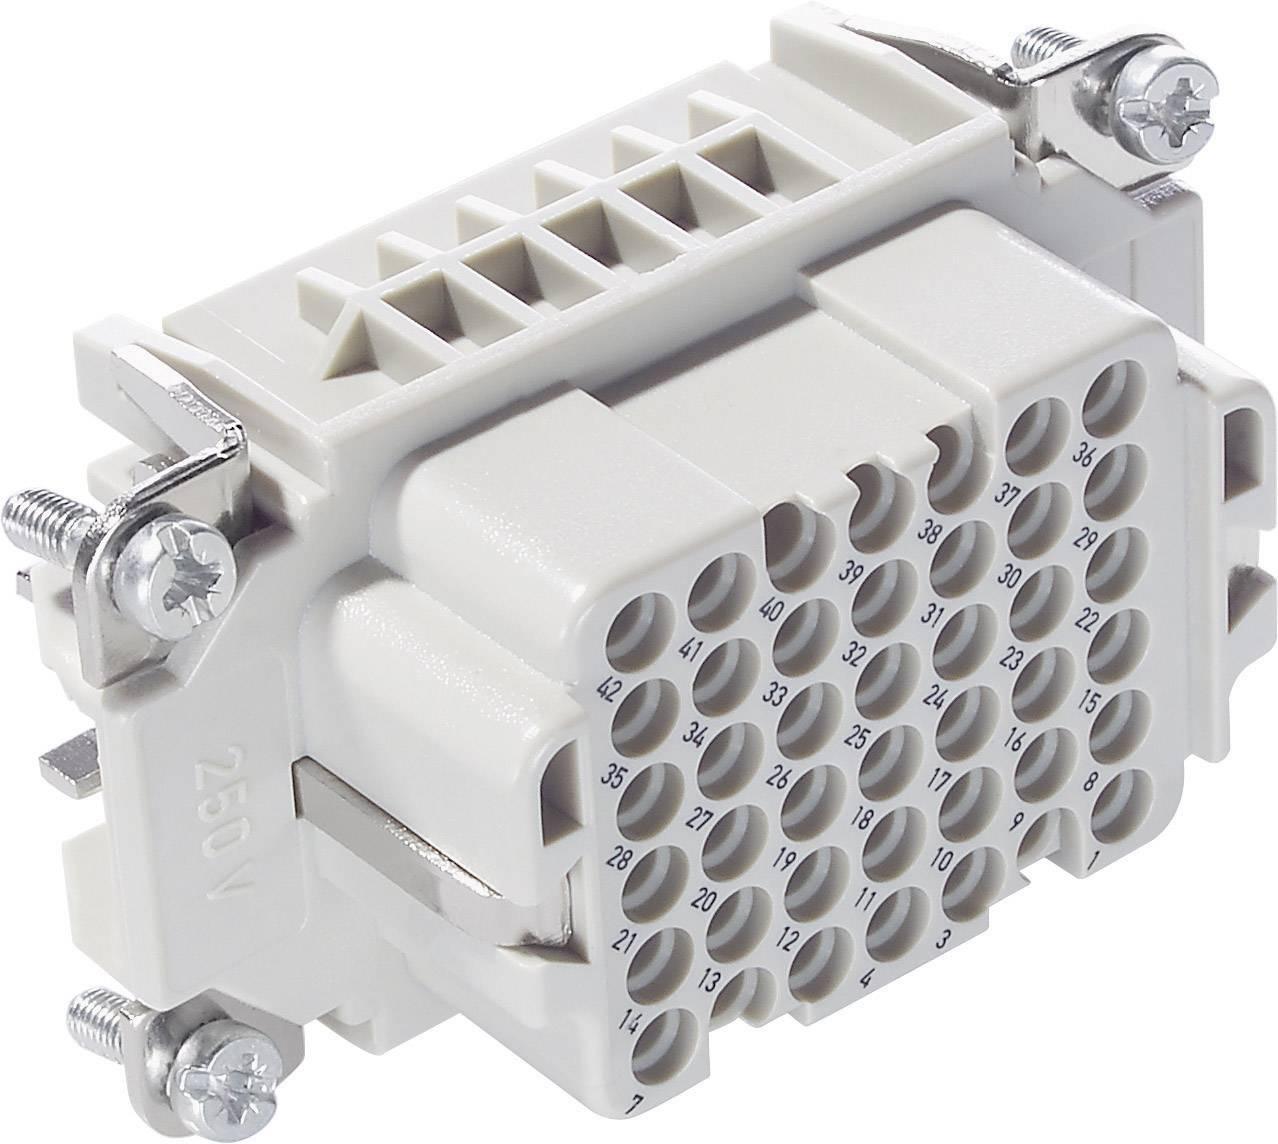 Sada konektorové zásuvky EPIC® H-DD 42 11286100 LappKabel počet kontaktů 42 + PE 1 ks